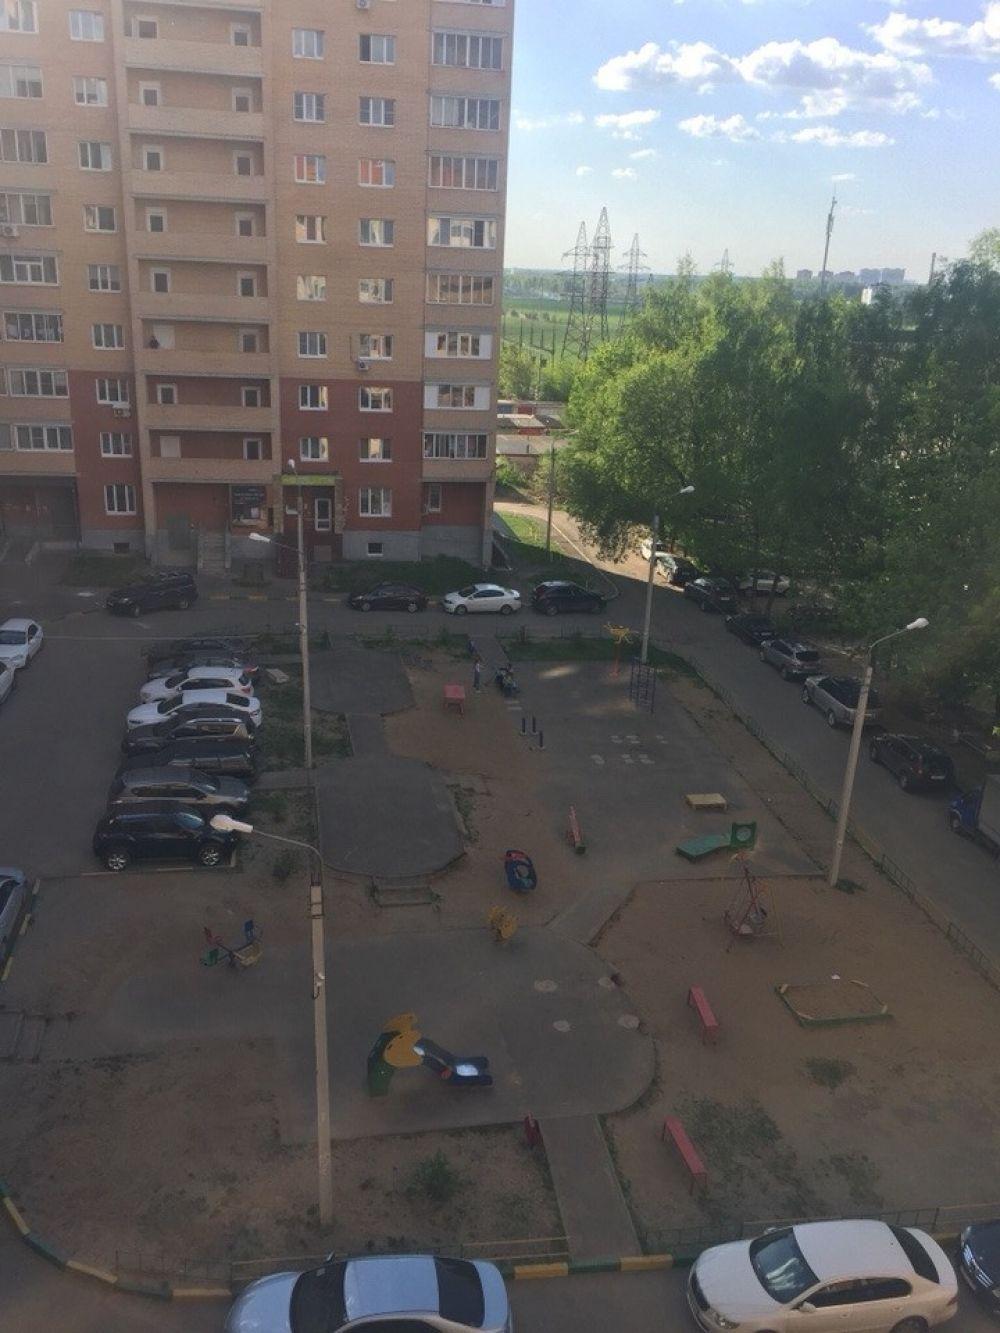 Однокомнатная квартира, 42 м2, Щёлково, ул 8 Марта, 11, фото 12